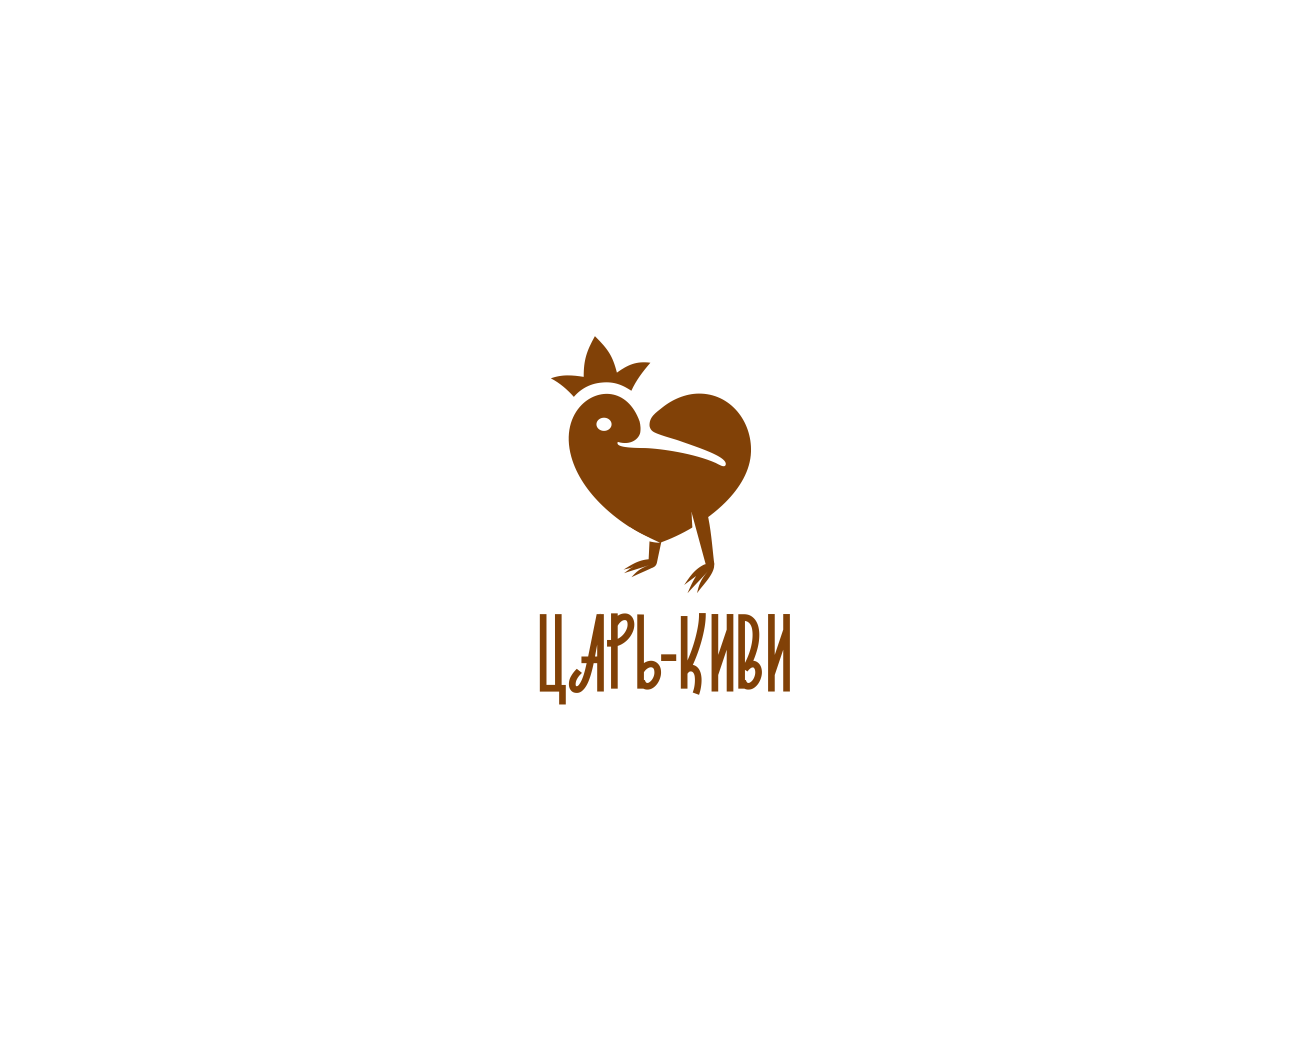 "Доработать дизайн логотипа кафе-кондитерской ""Царь-Киви"" фото f_7295a09903f080e5.png"